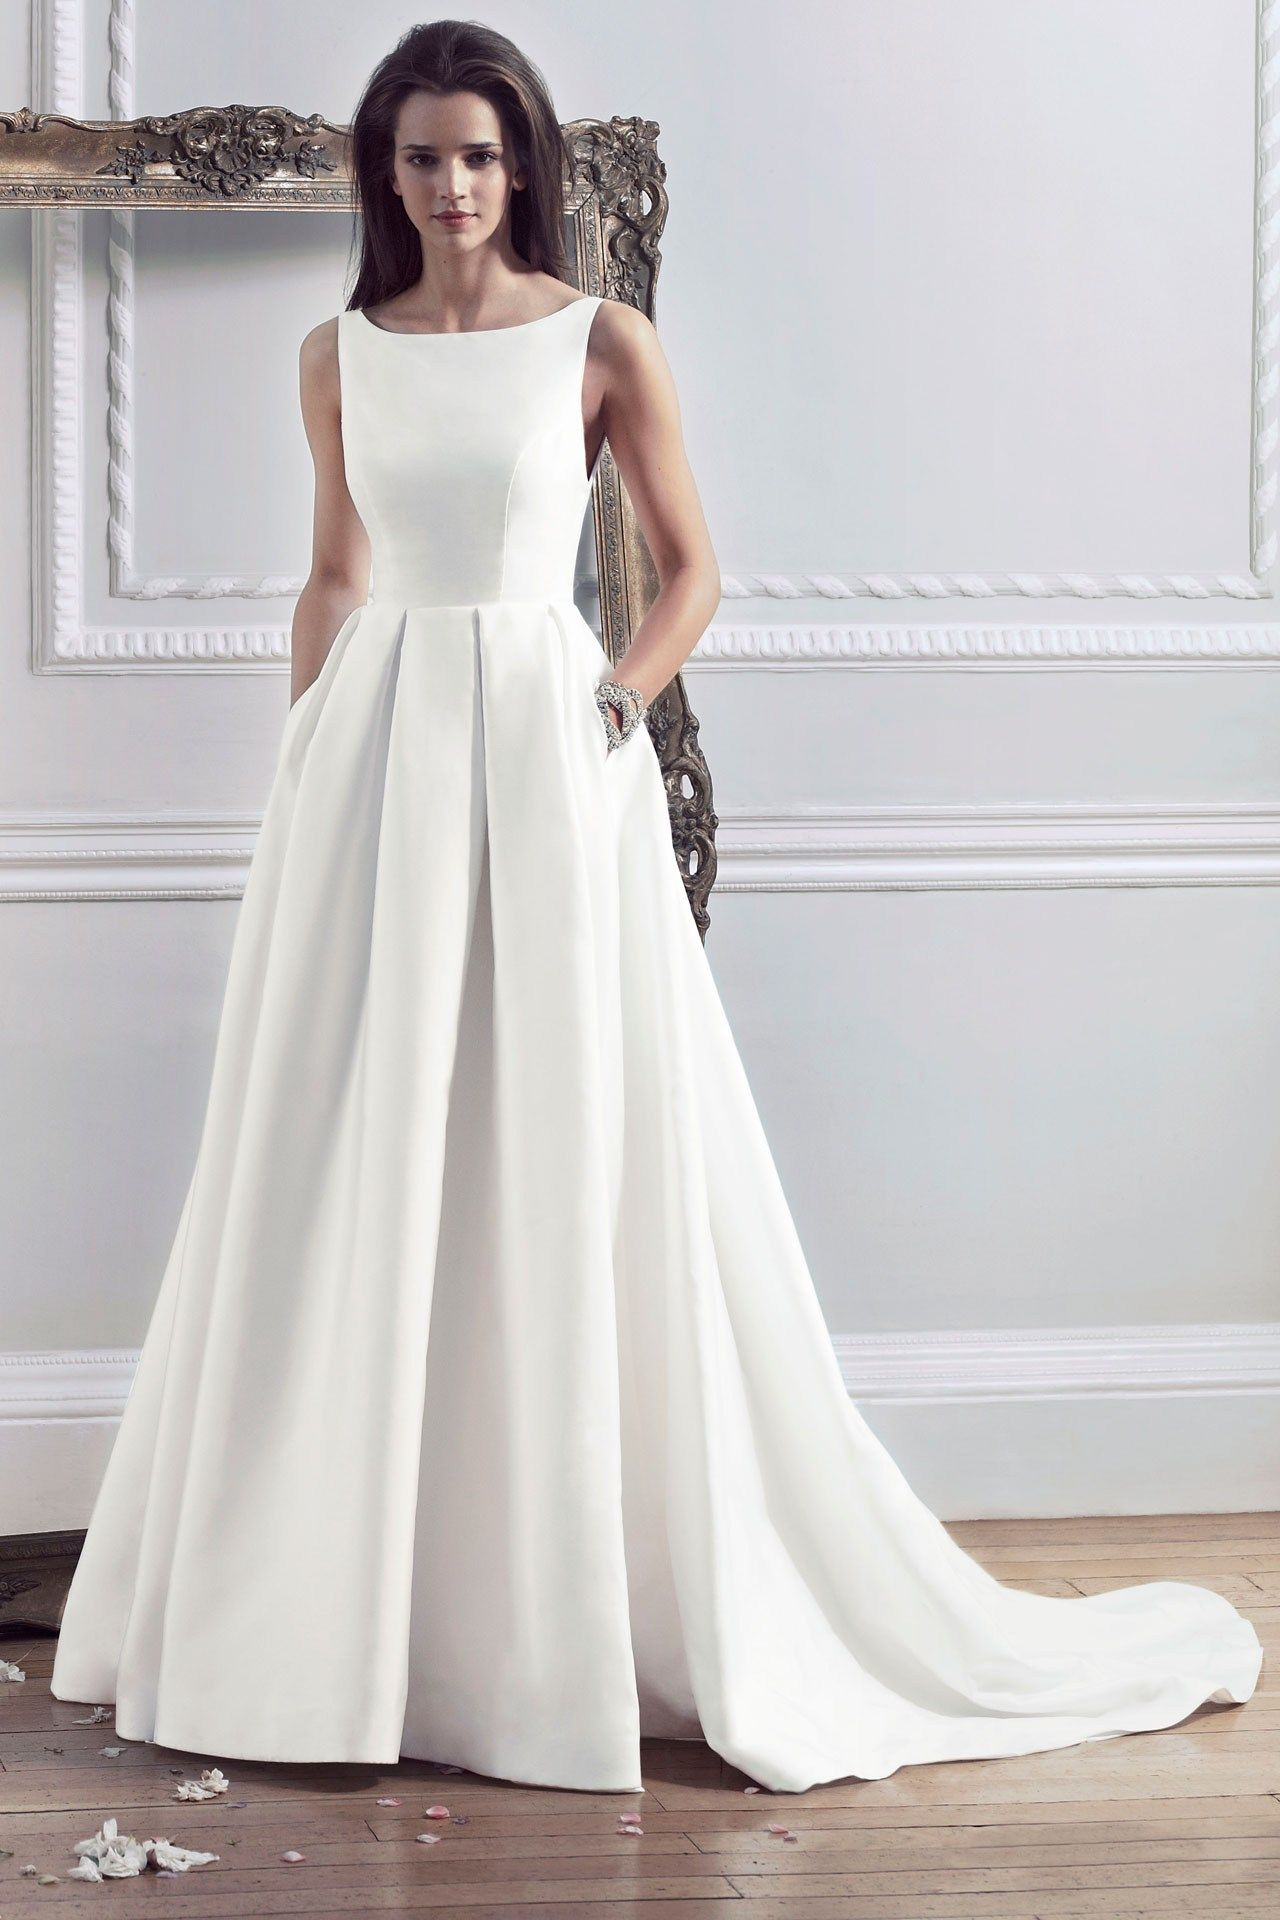 Wedding dresses caroline castigliano english heritage english